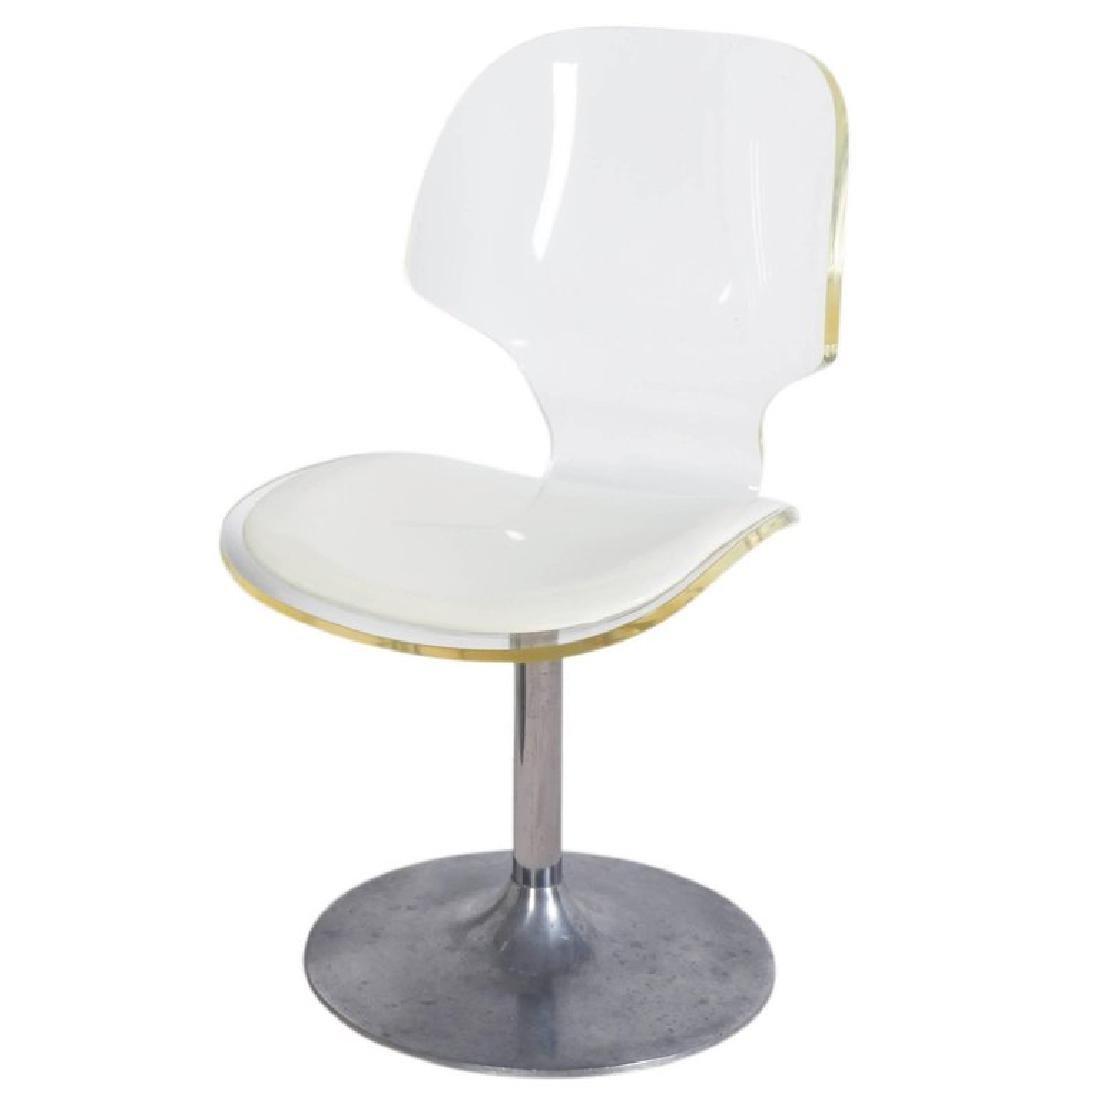 Hill MFG Lucite Chair on Aluminium Tulip Base